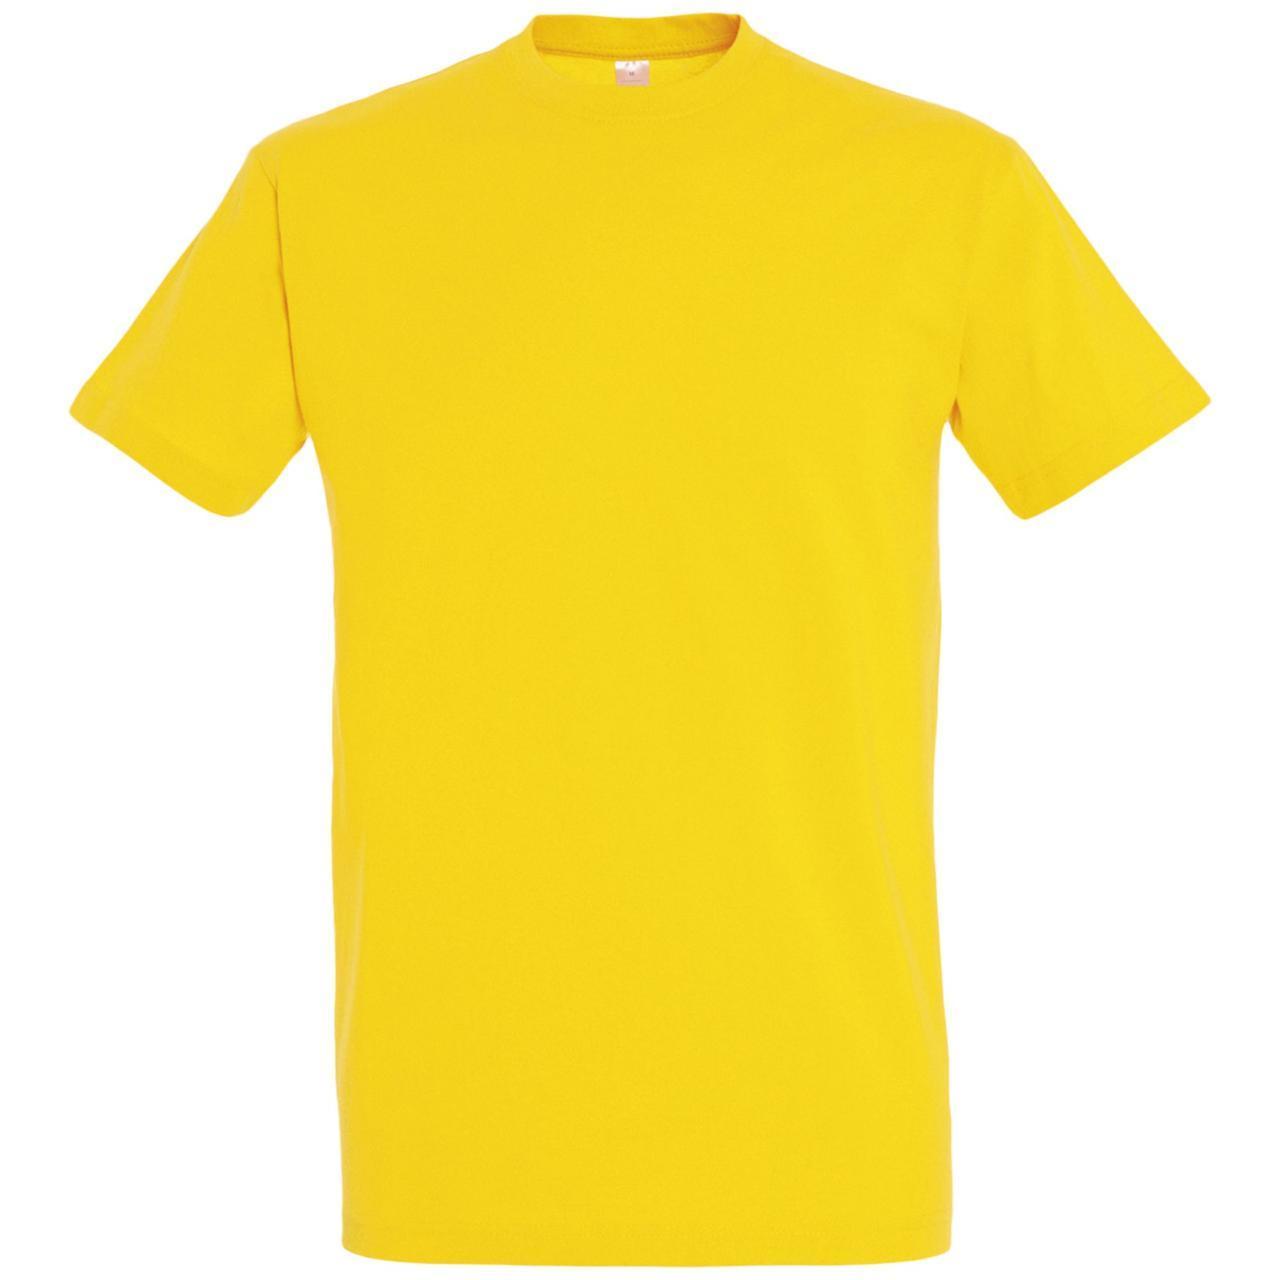 Oднотонная футболка | Желтая | 160 гр. | S